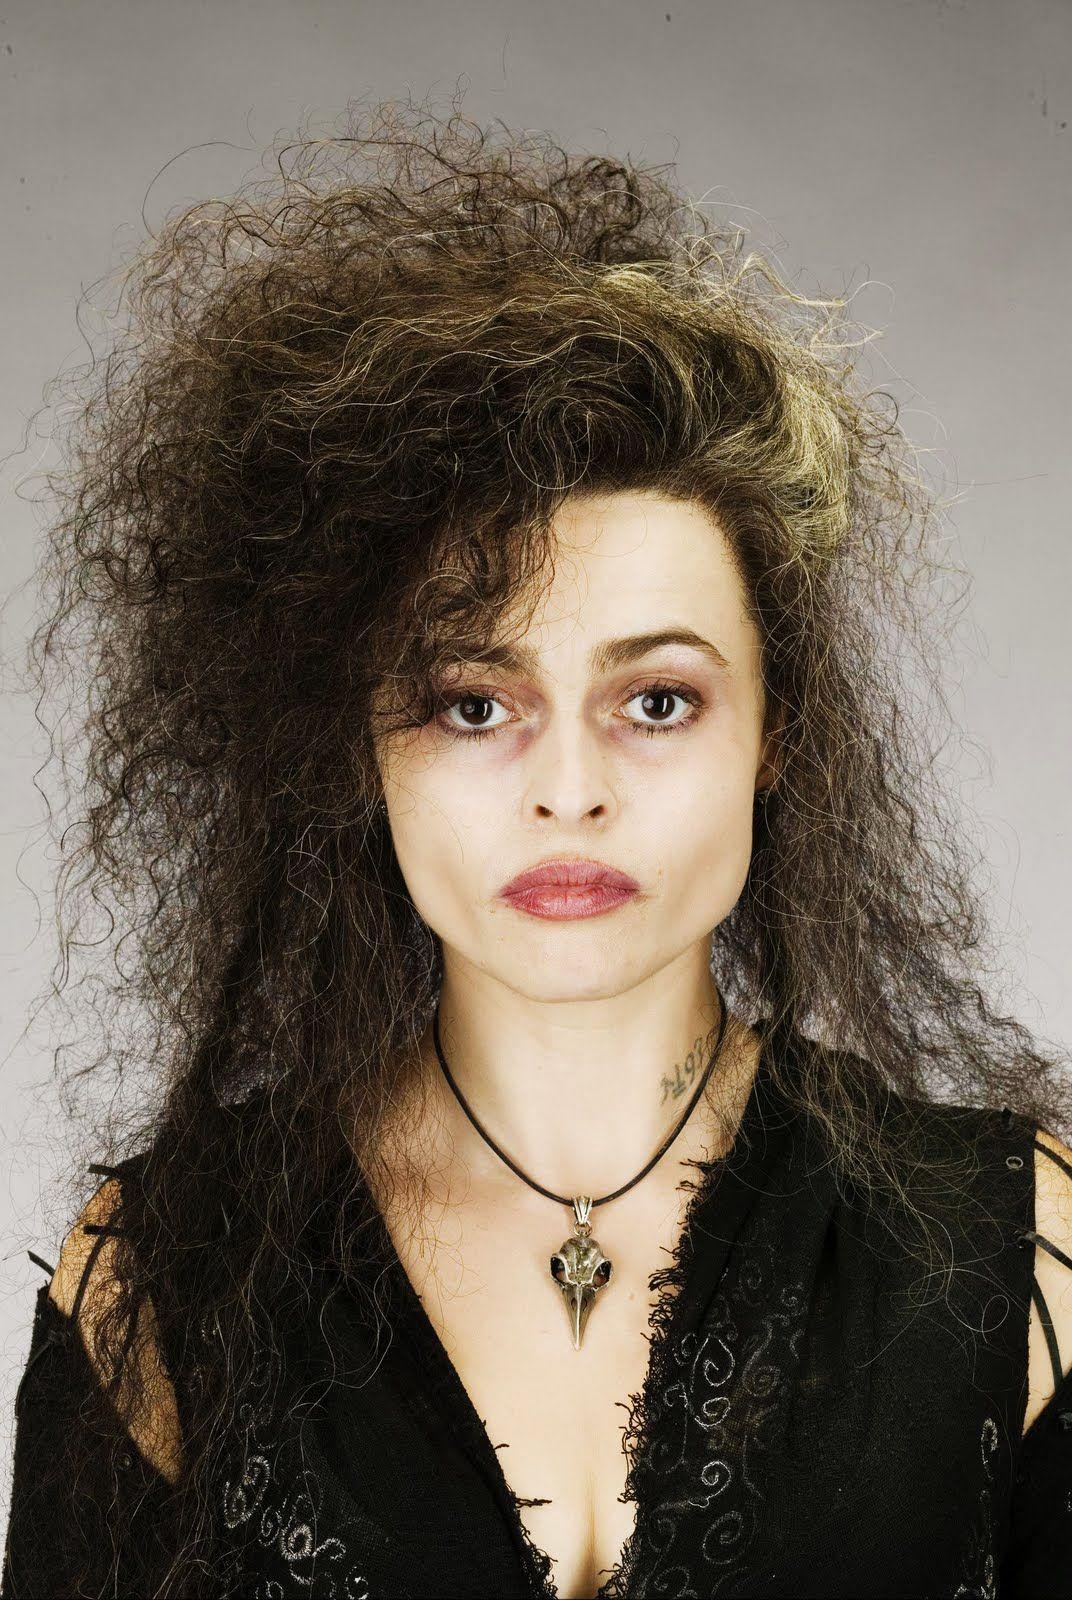 Bellatrix LeStrange Hair and Makeup | Halloween & Costumes ...